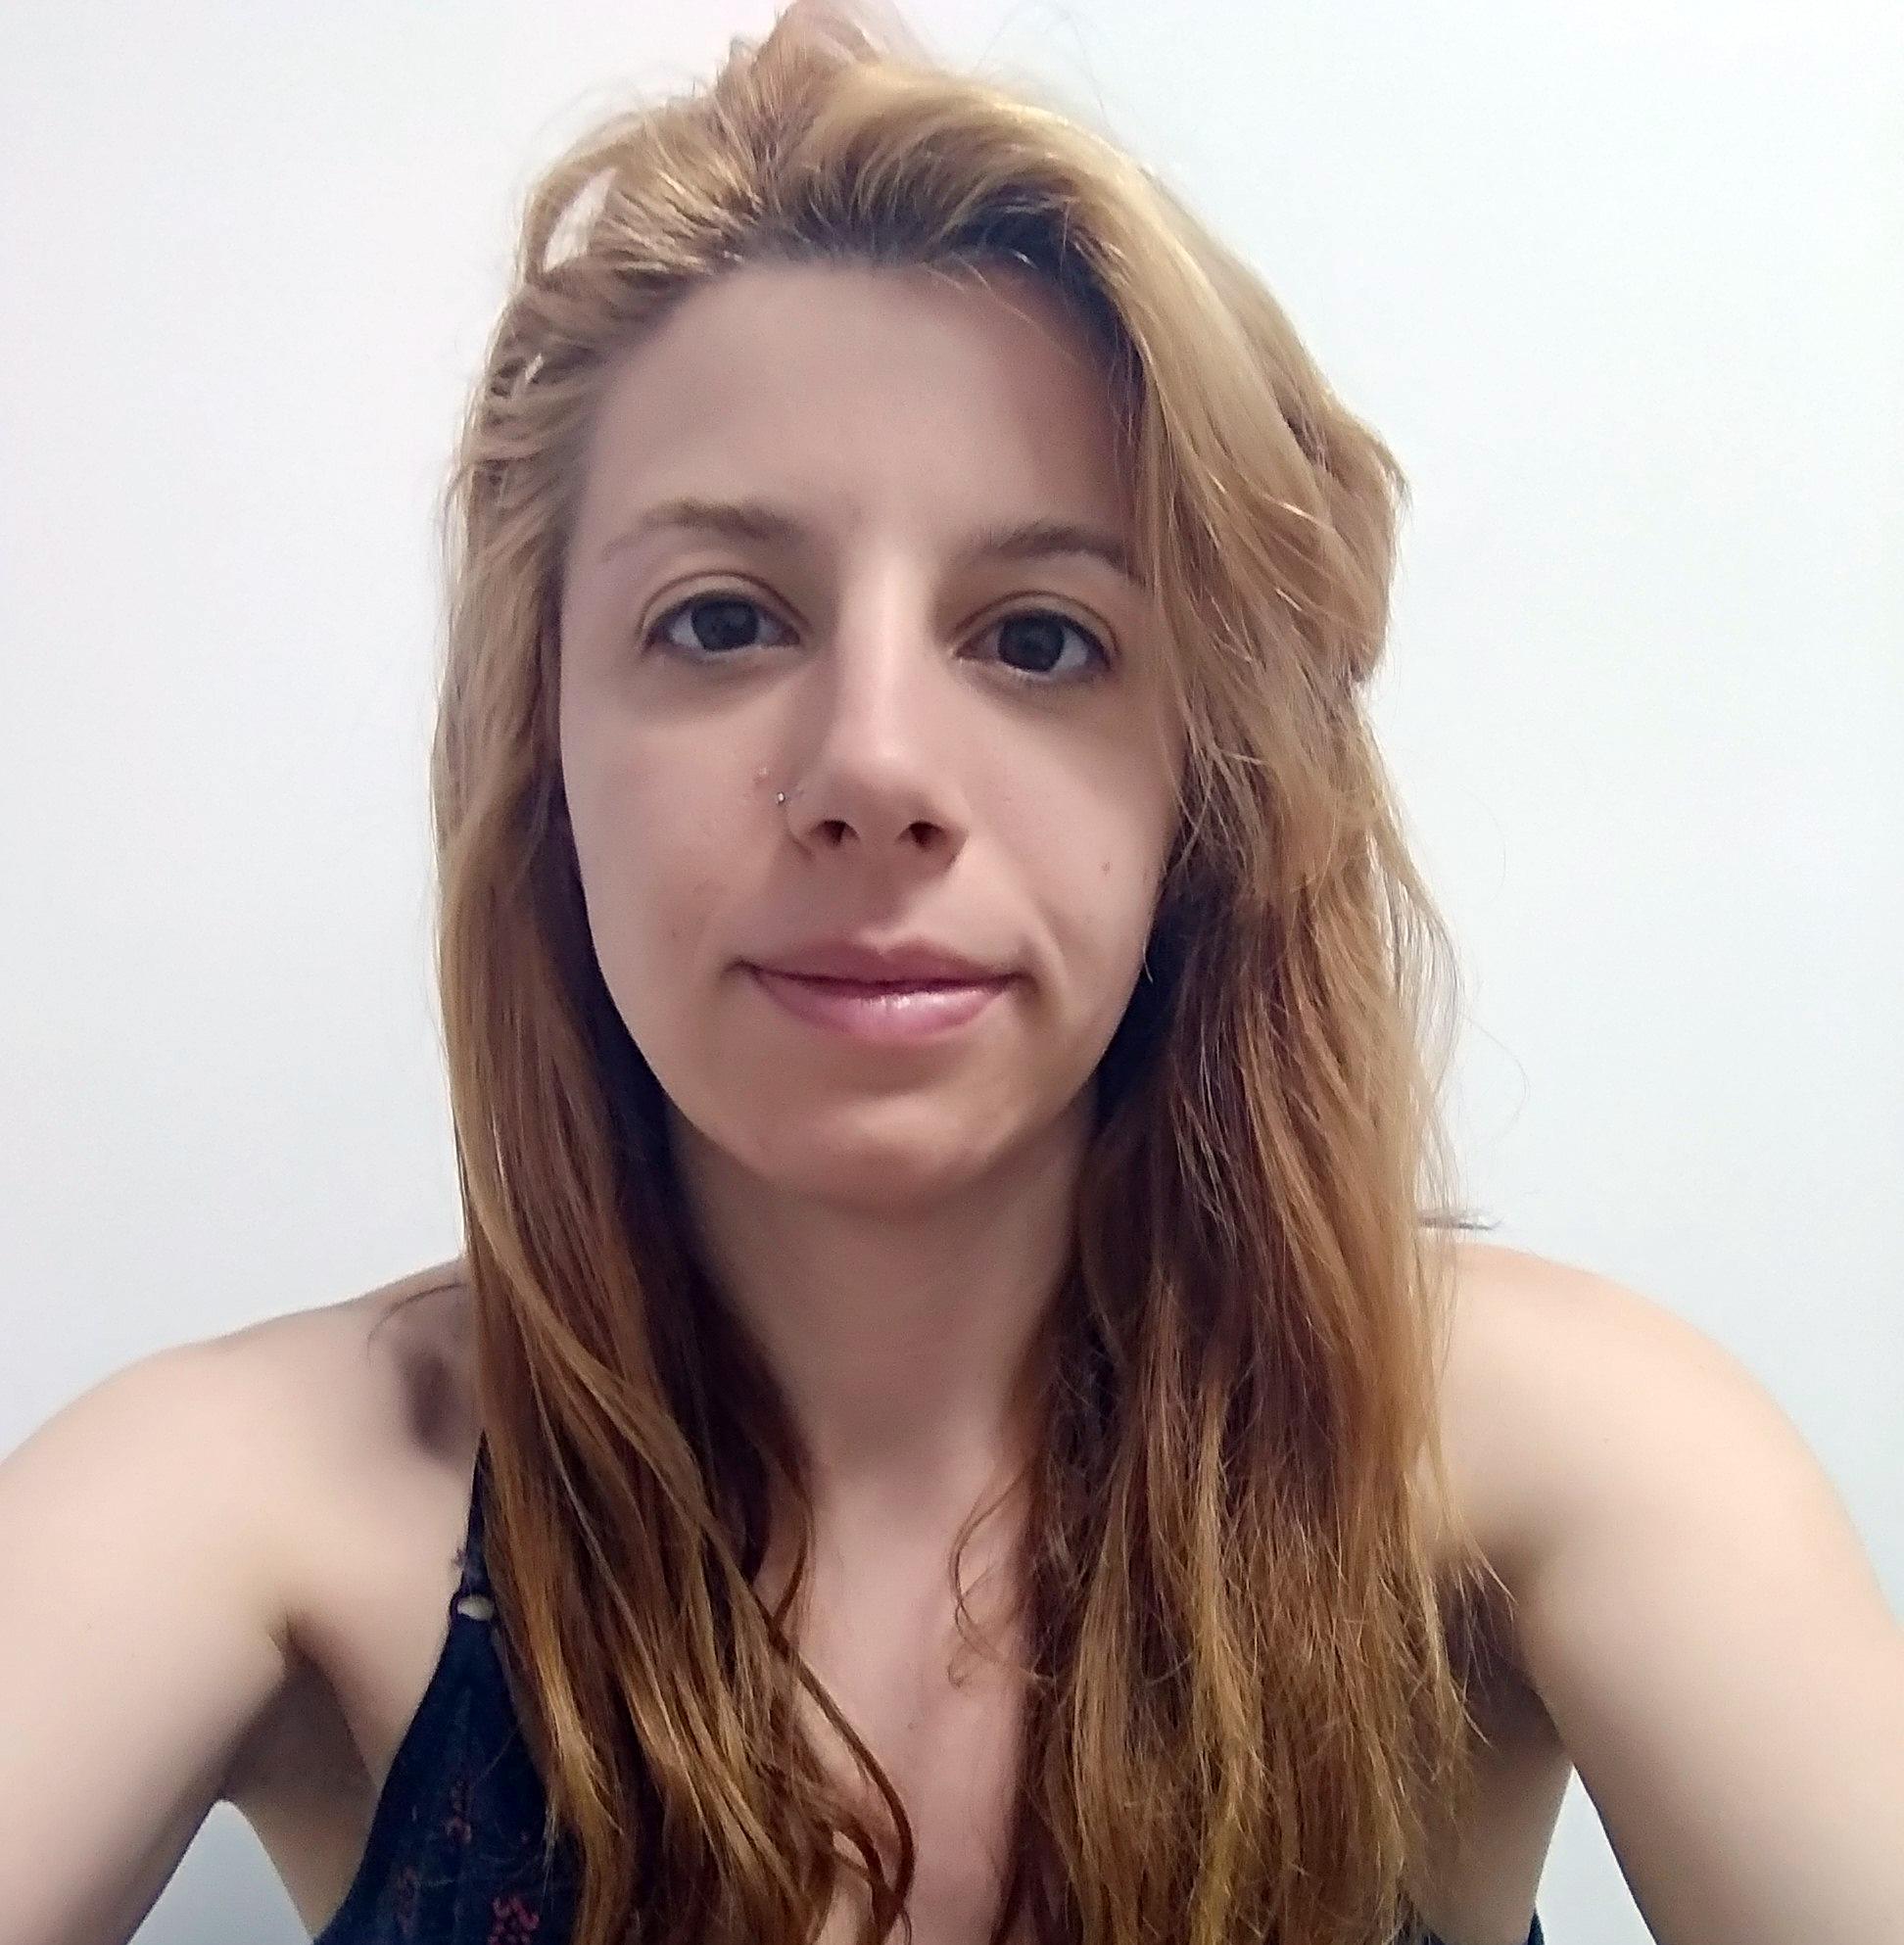 Ana Blanca Meister Monzón